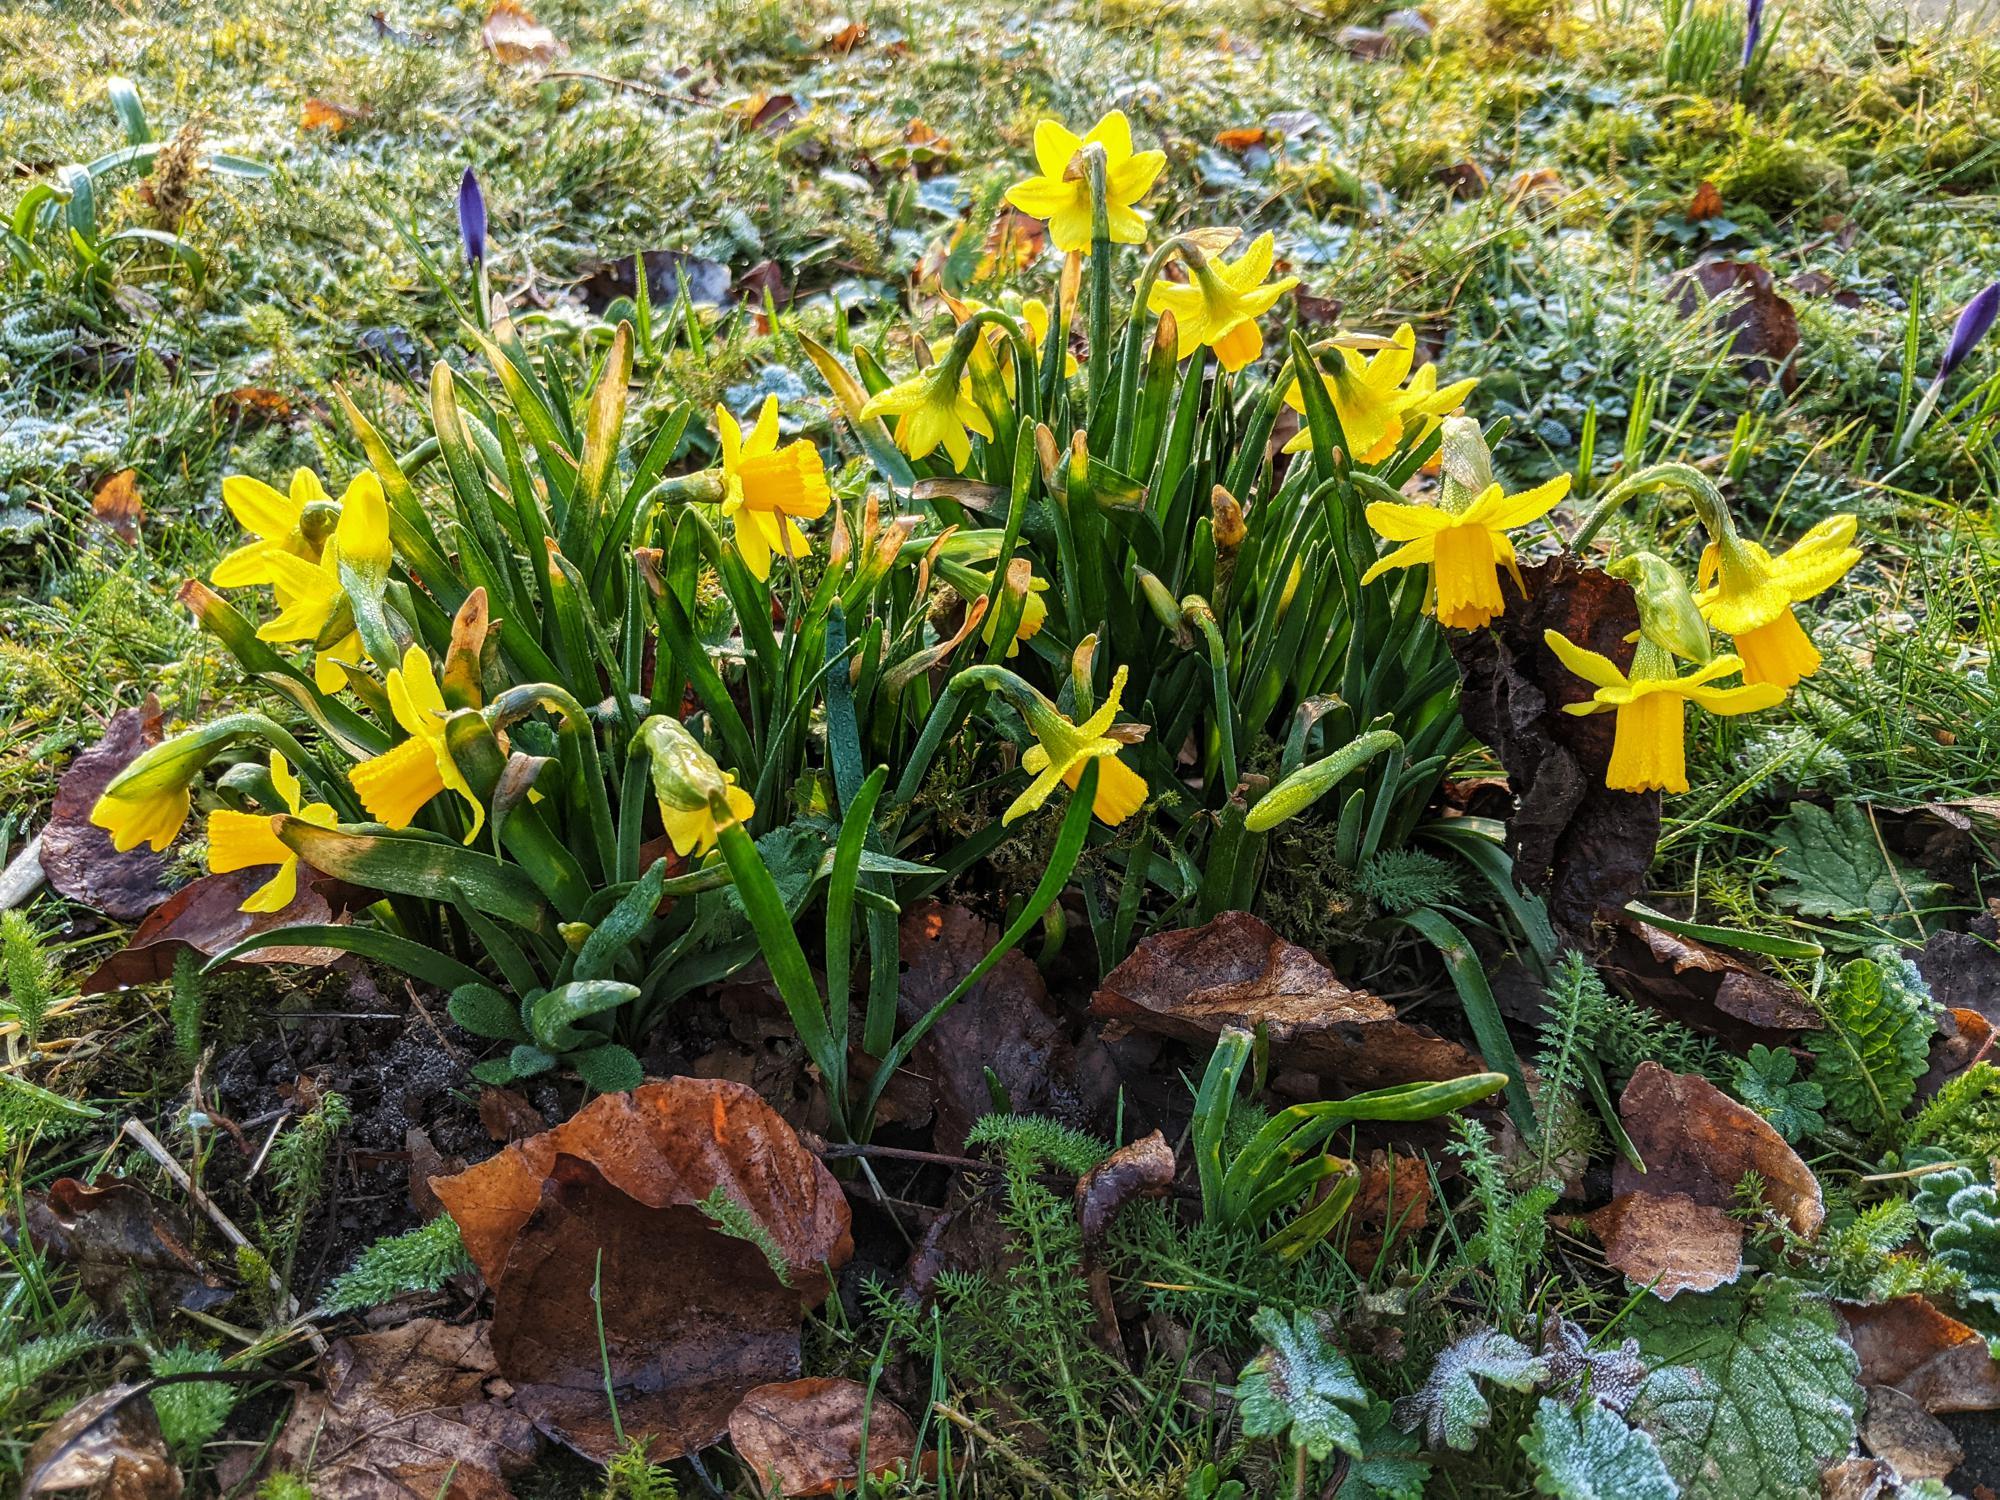 Crocus and daffodil flowers